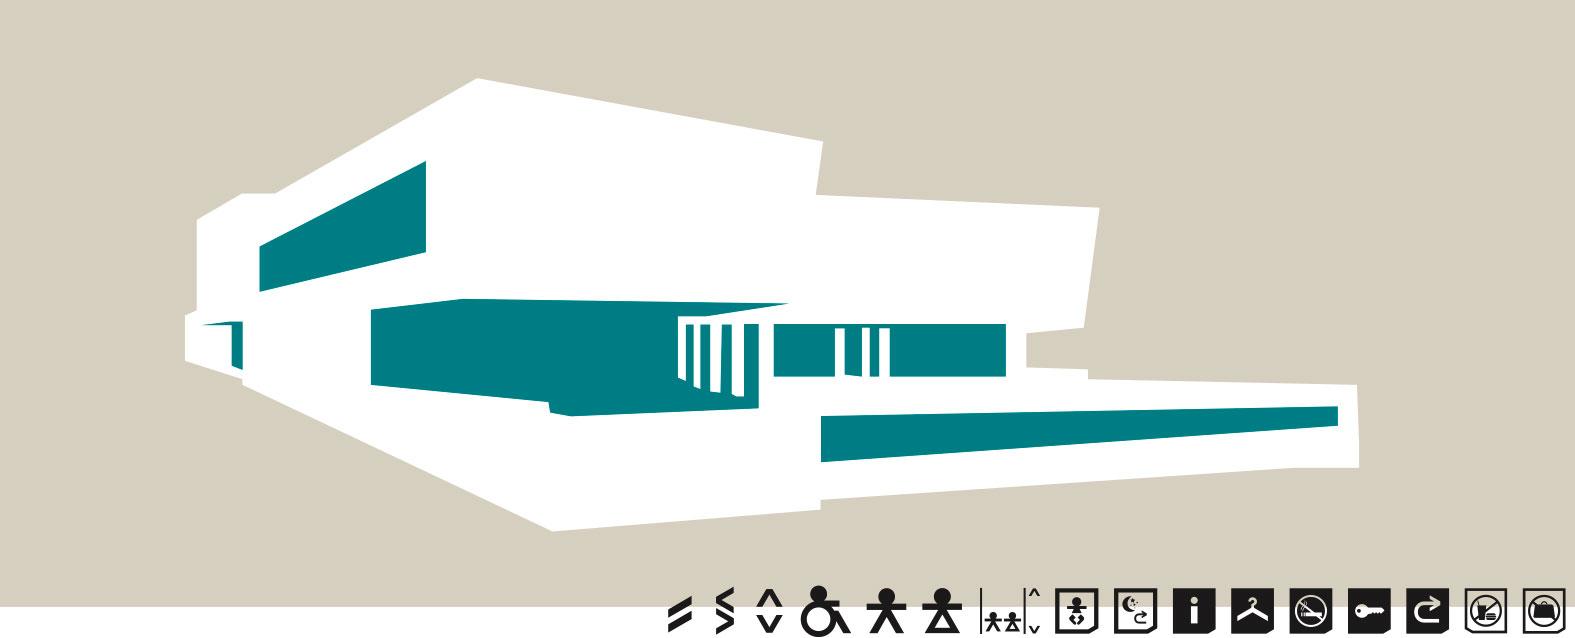 stadtbibo-ndh-02